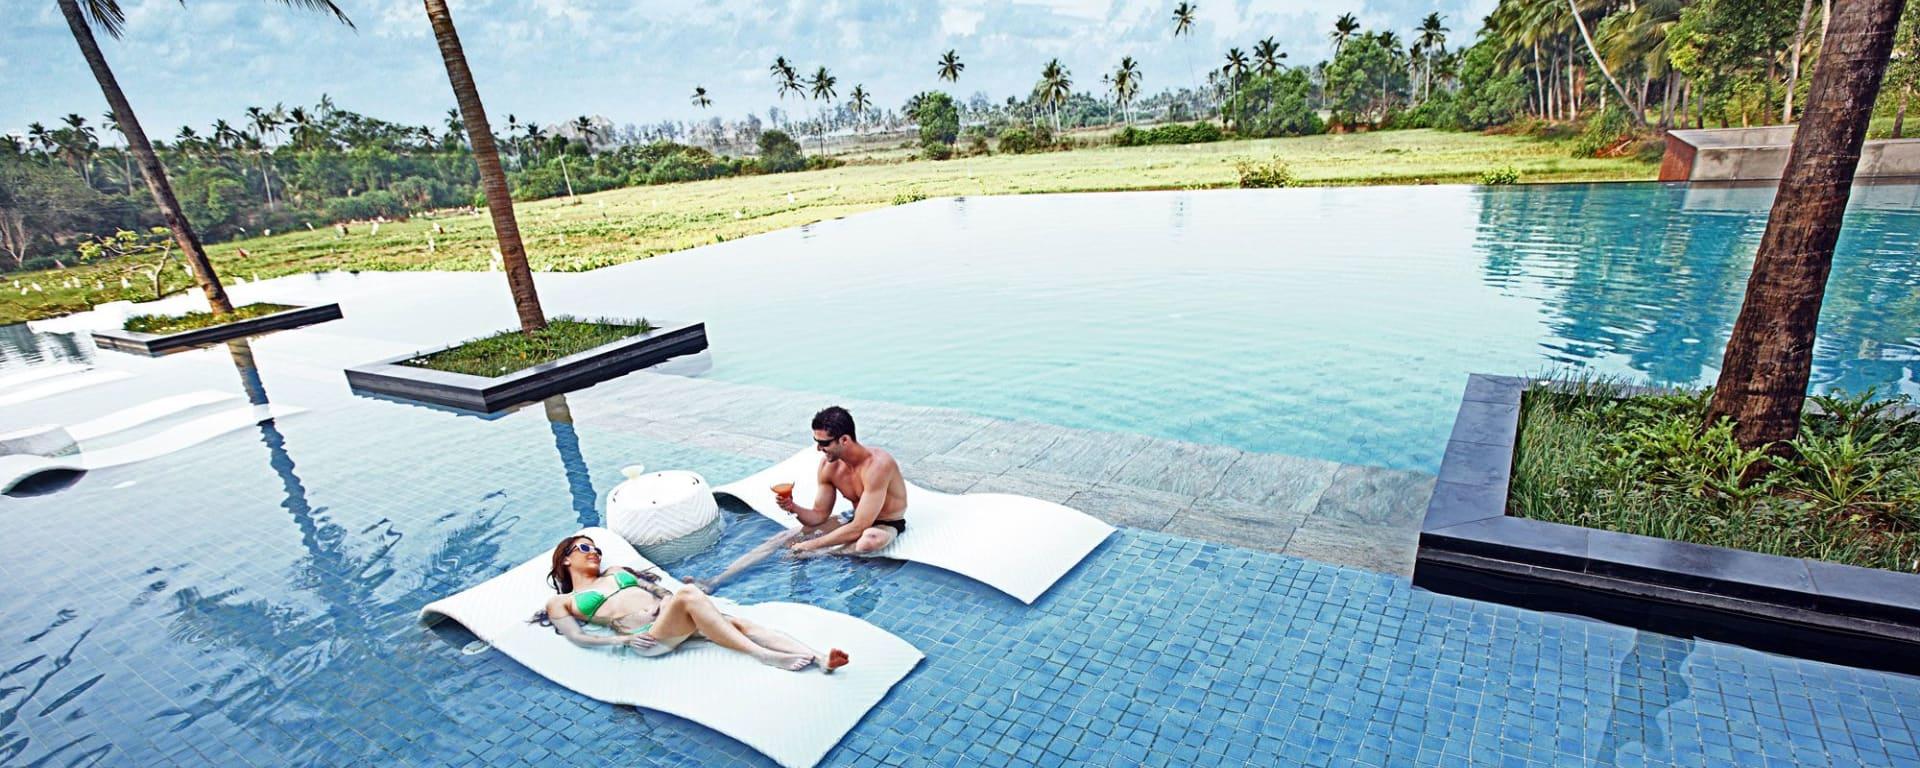 Alila Diwa Goa & The Diwa Club by Alila: Pool